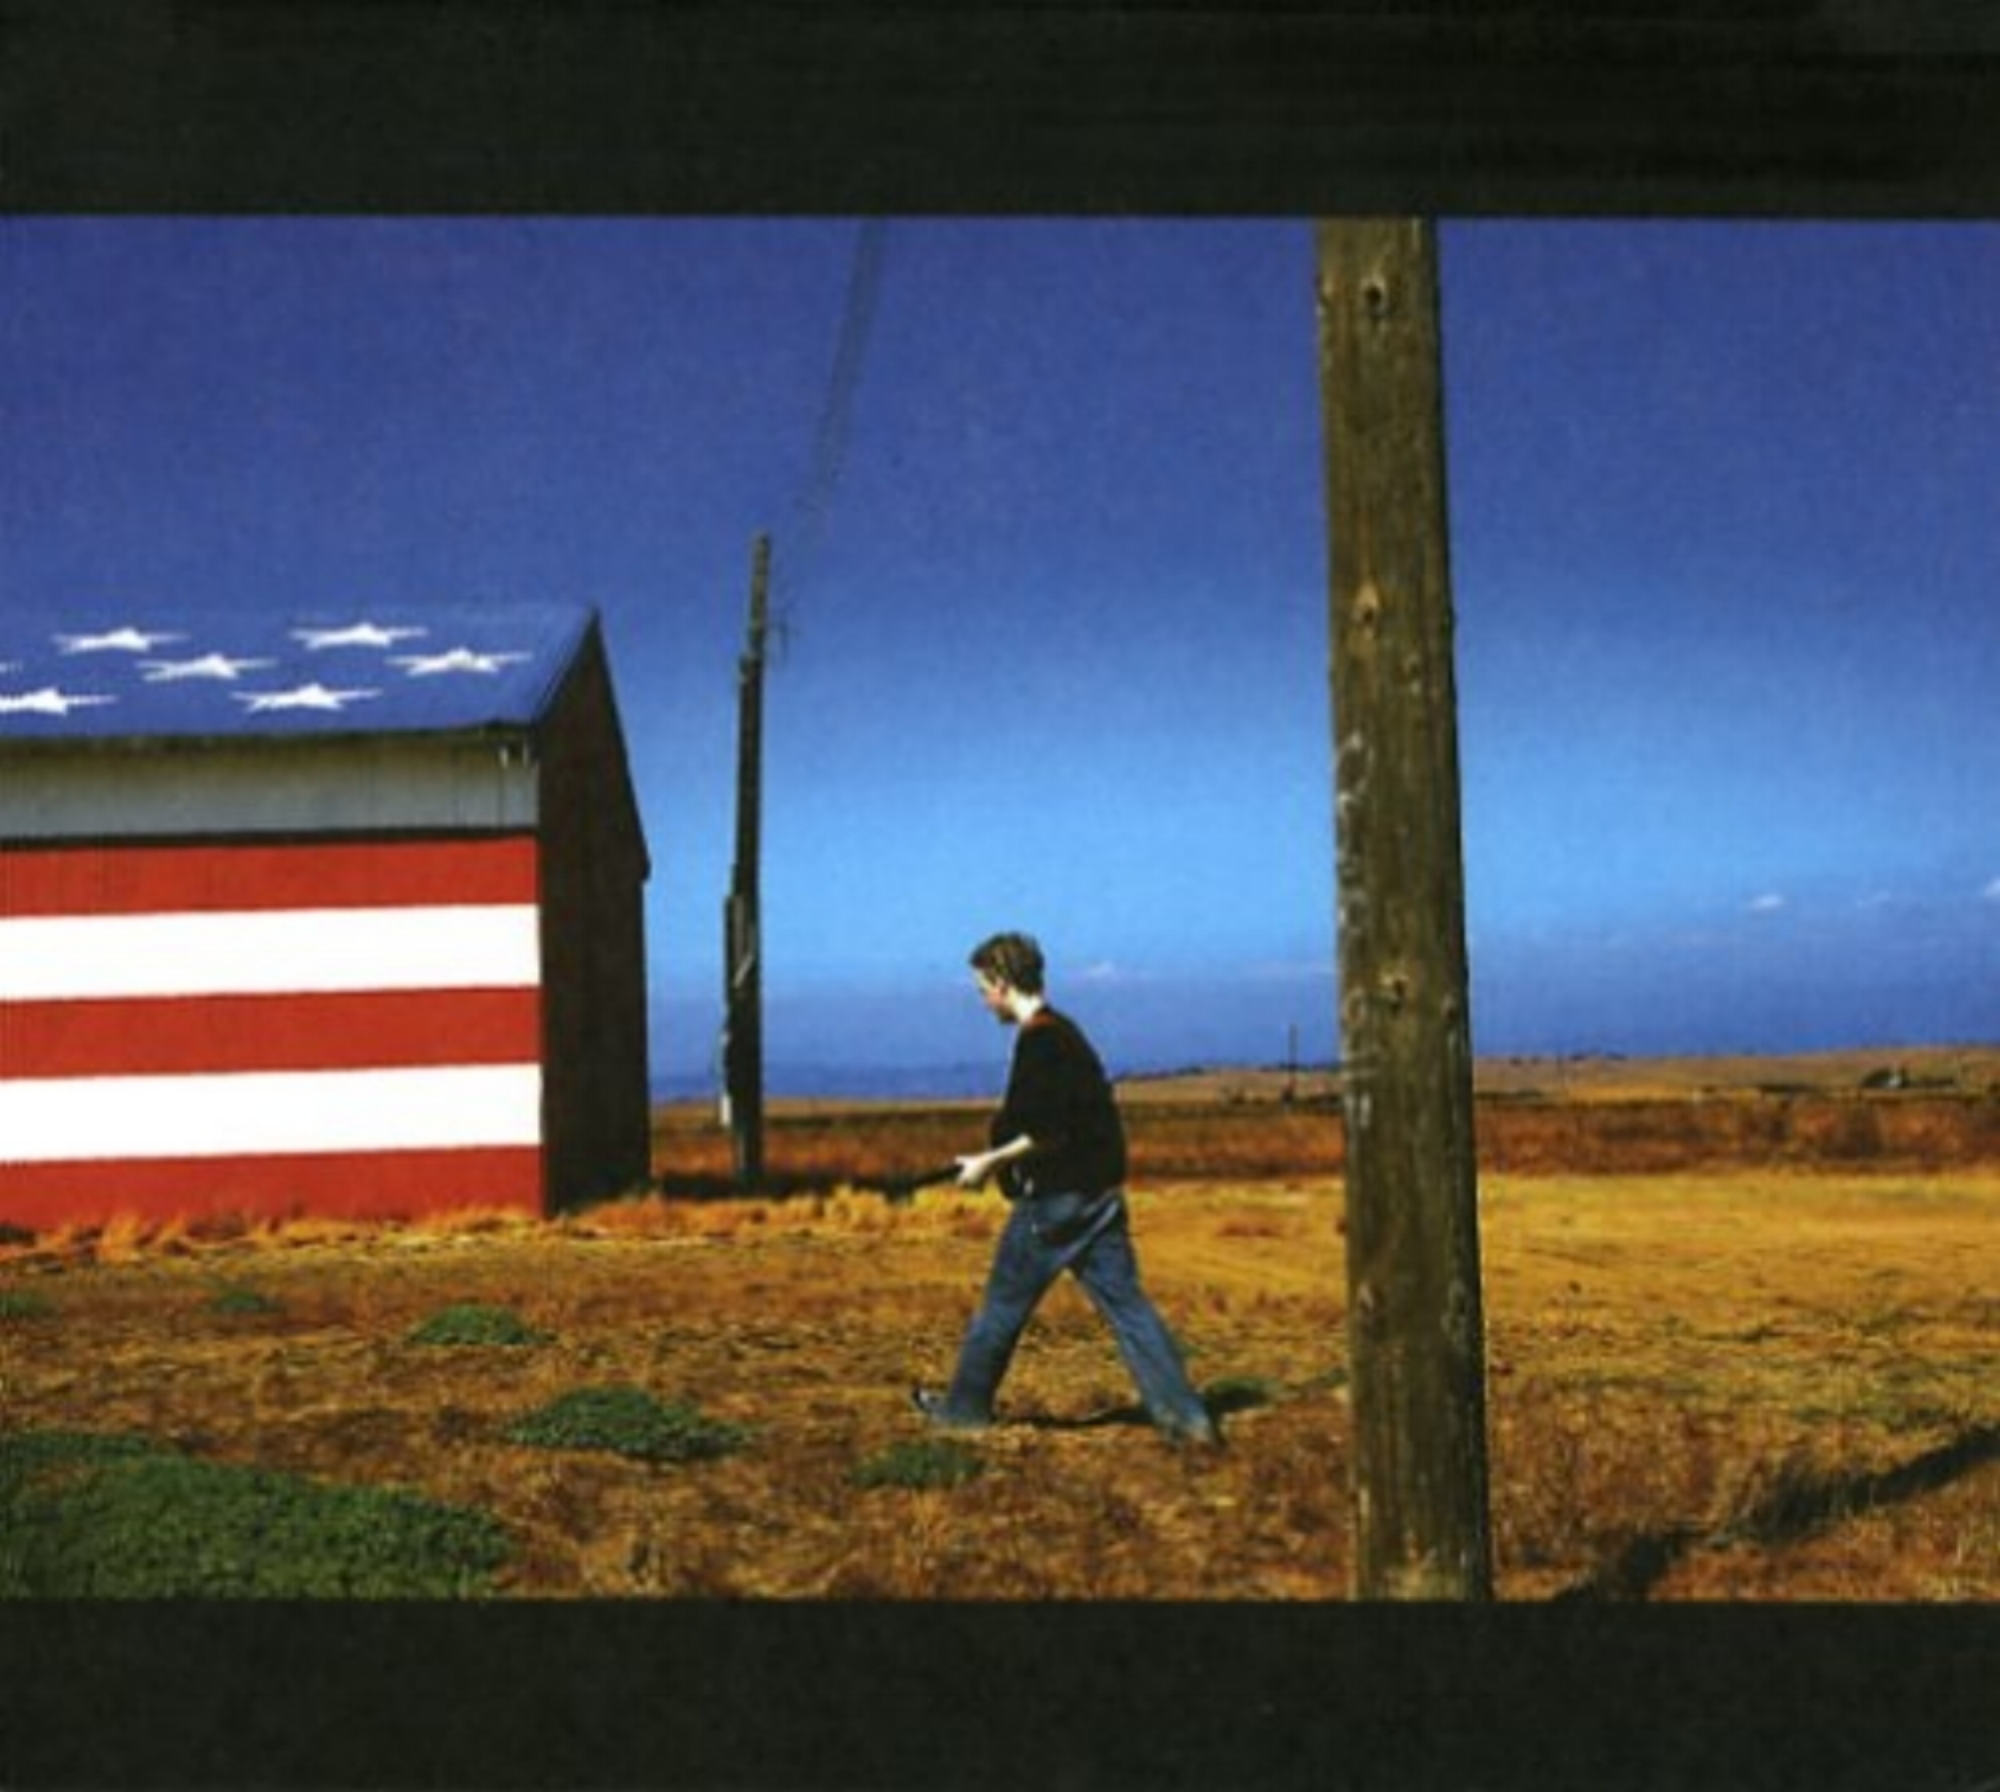 AMERICAN WAY (2004)